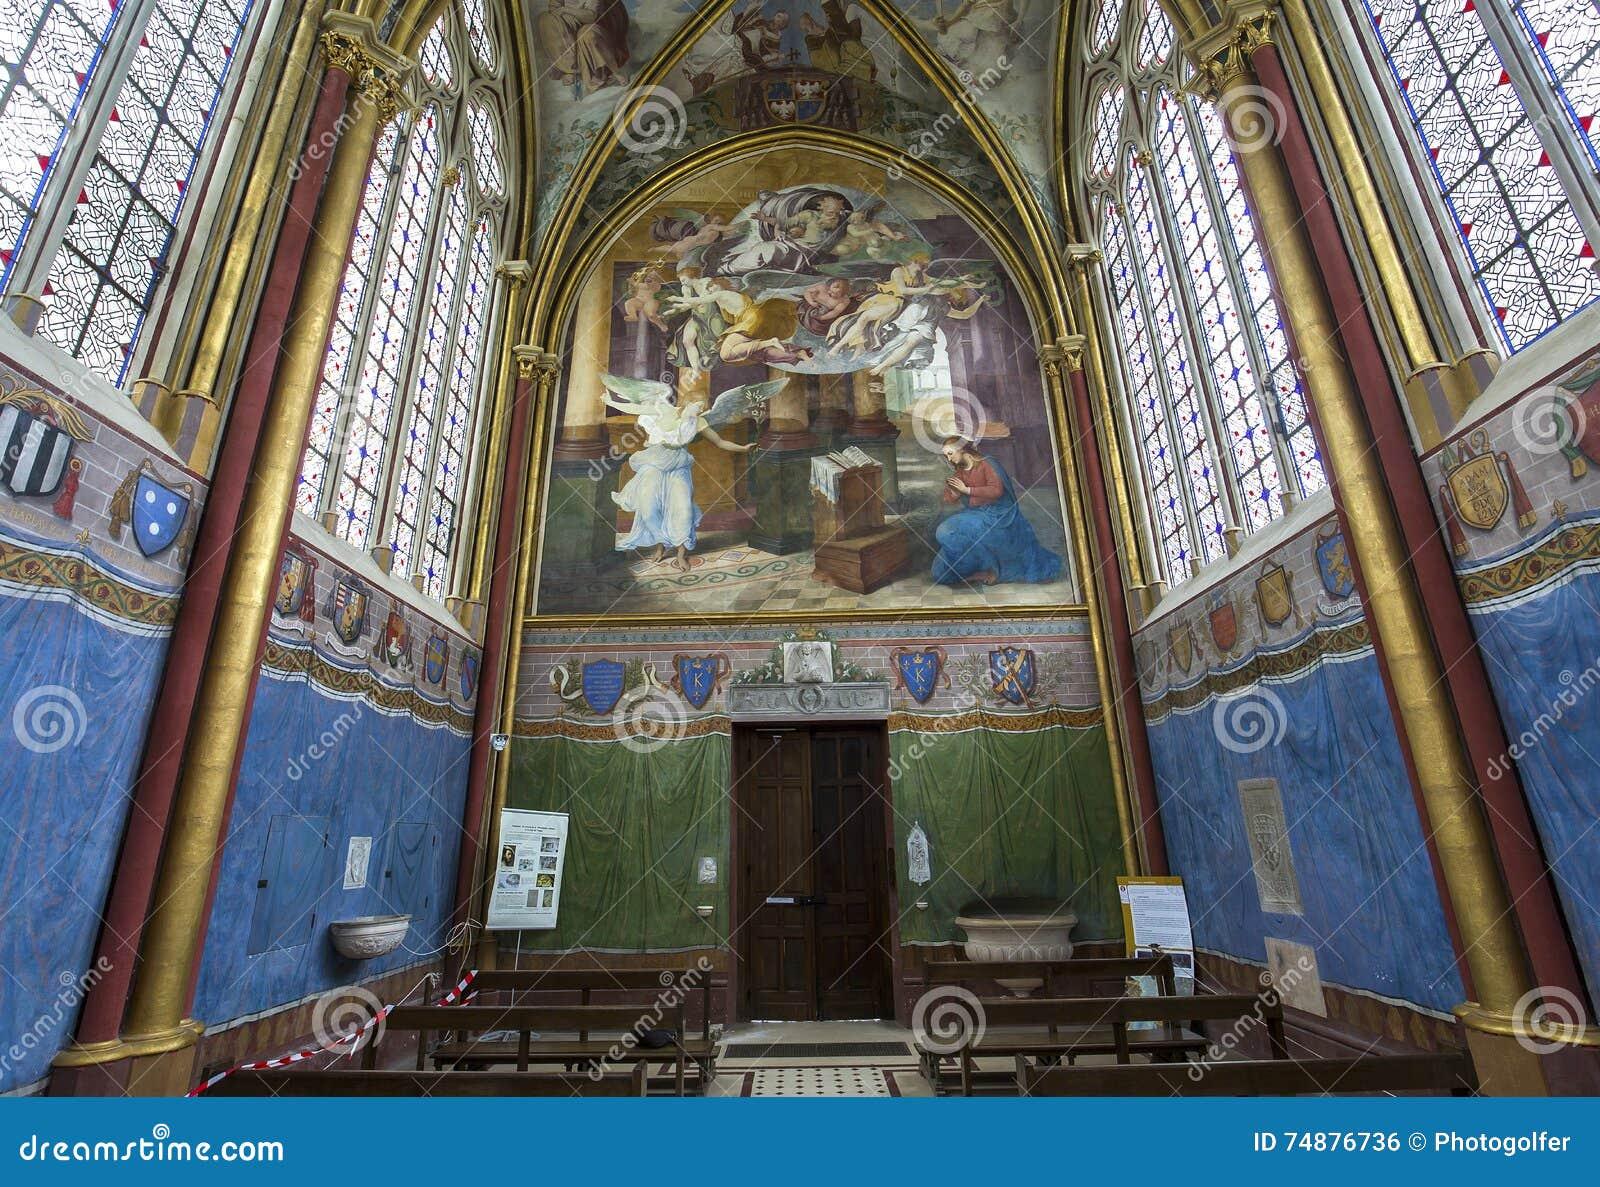 Primatice kapell, Chaalis abbotskloster, Chaalis, Frankrike